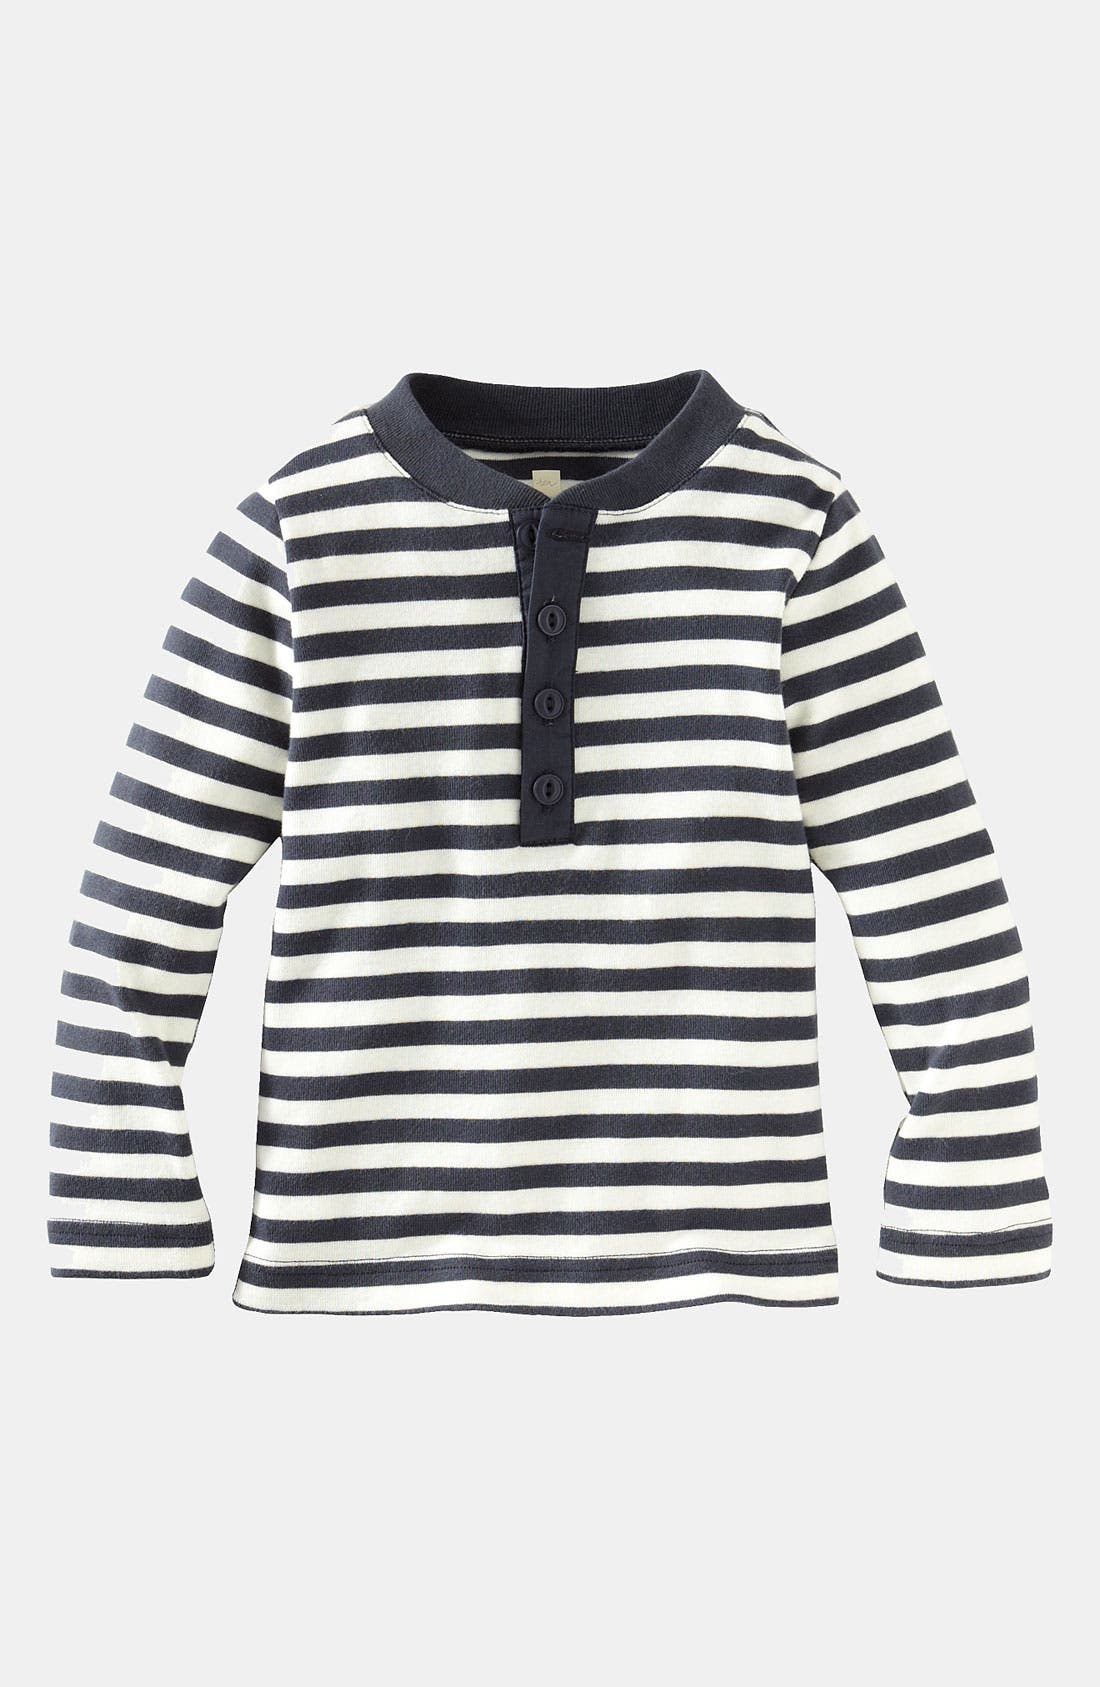 Alternate Image 1 Selected - Tea Collection 'Vilakazi' Henley Shirt (Infant)